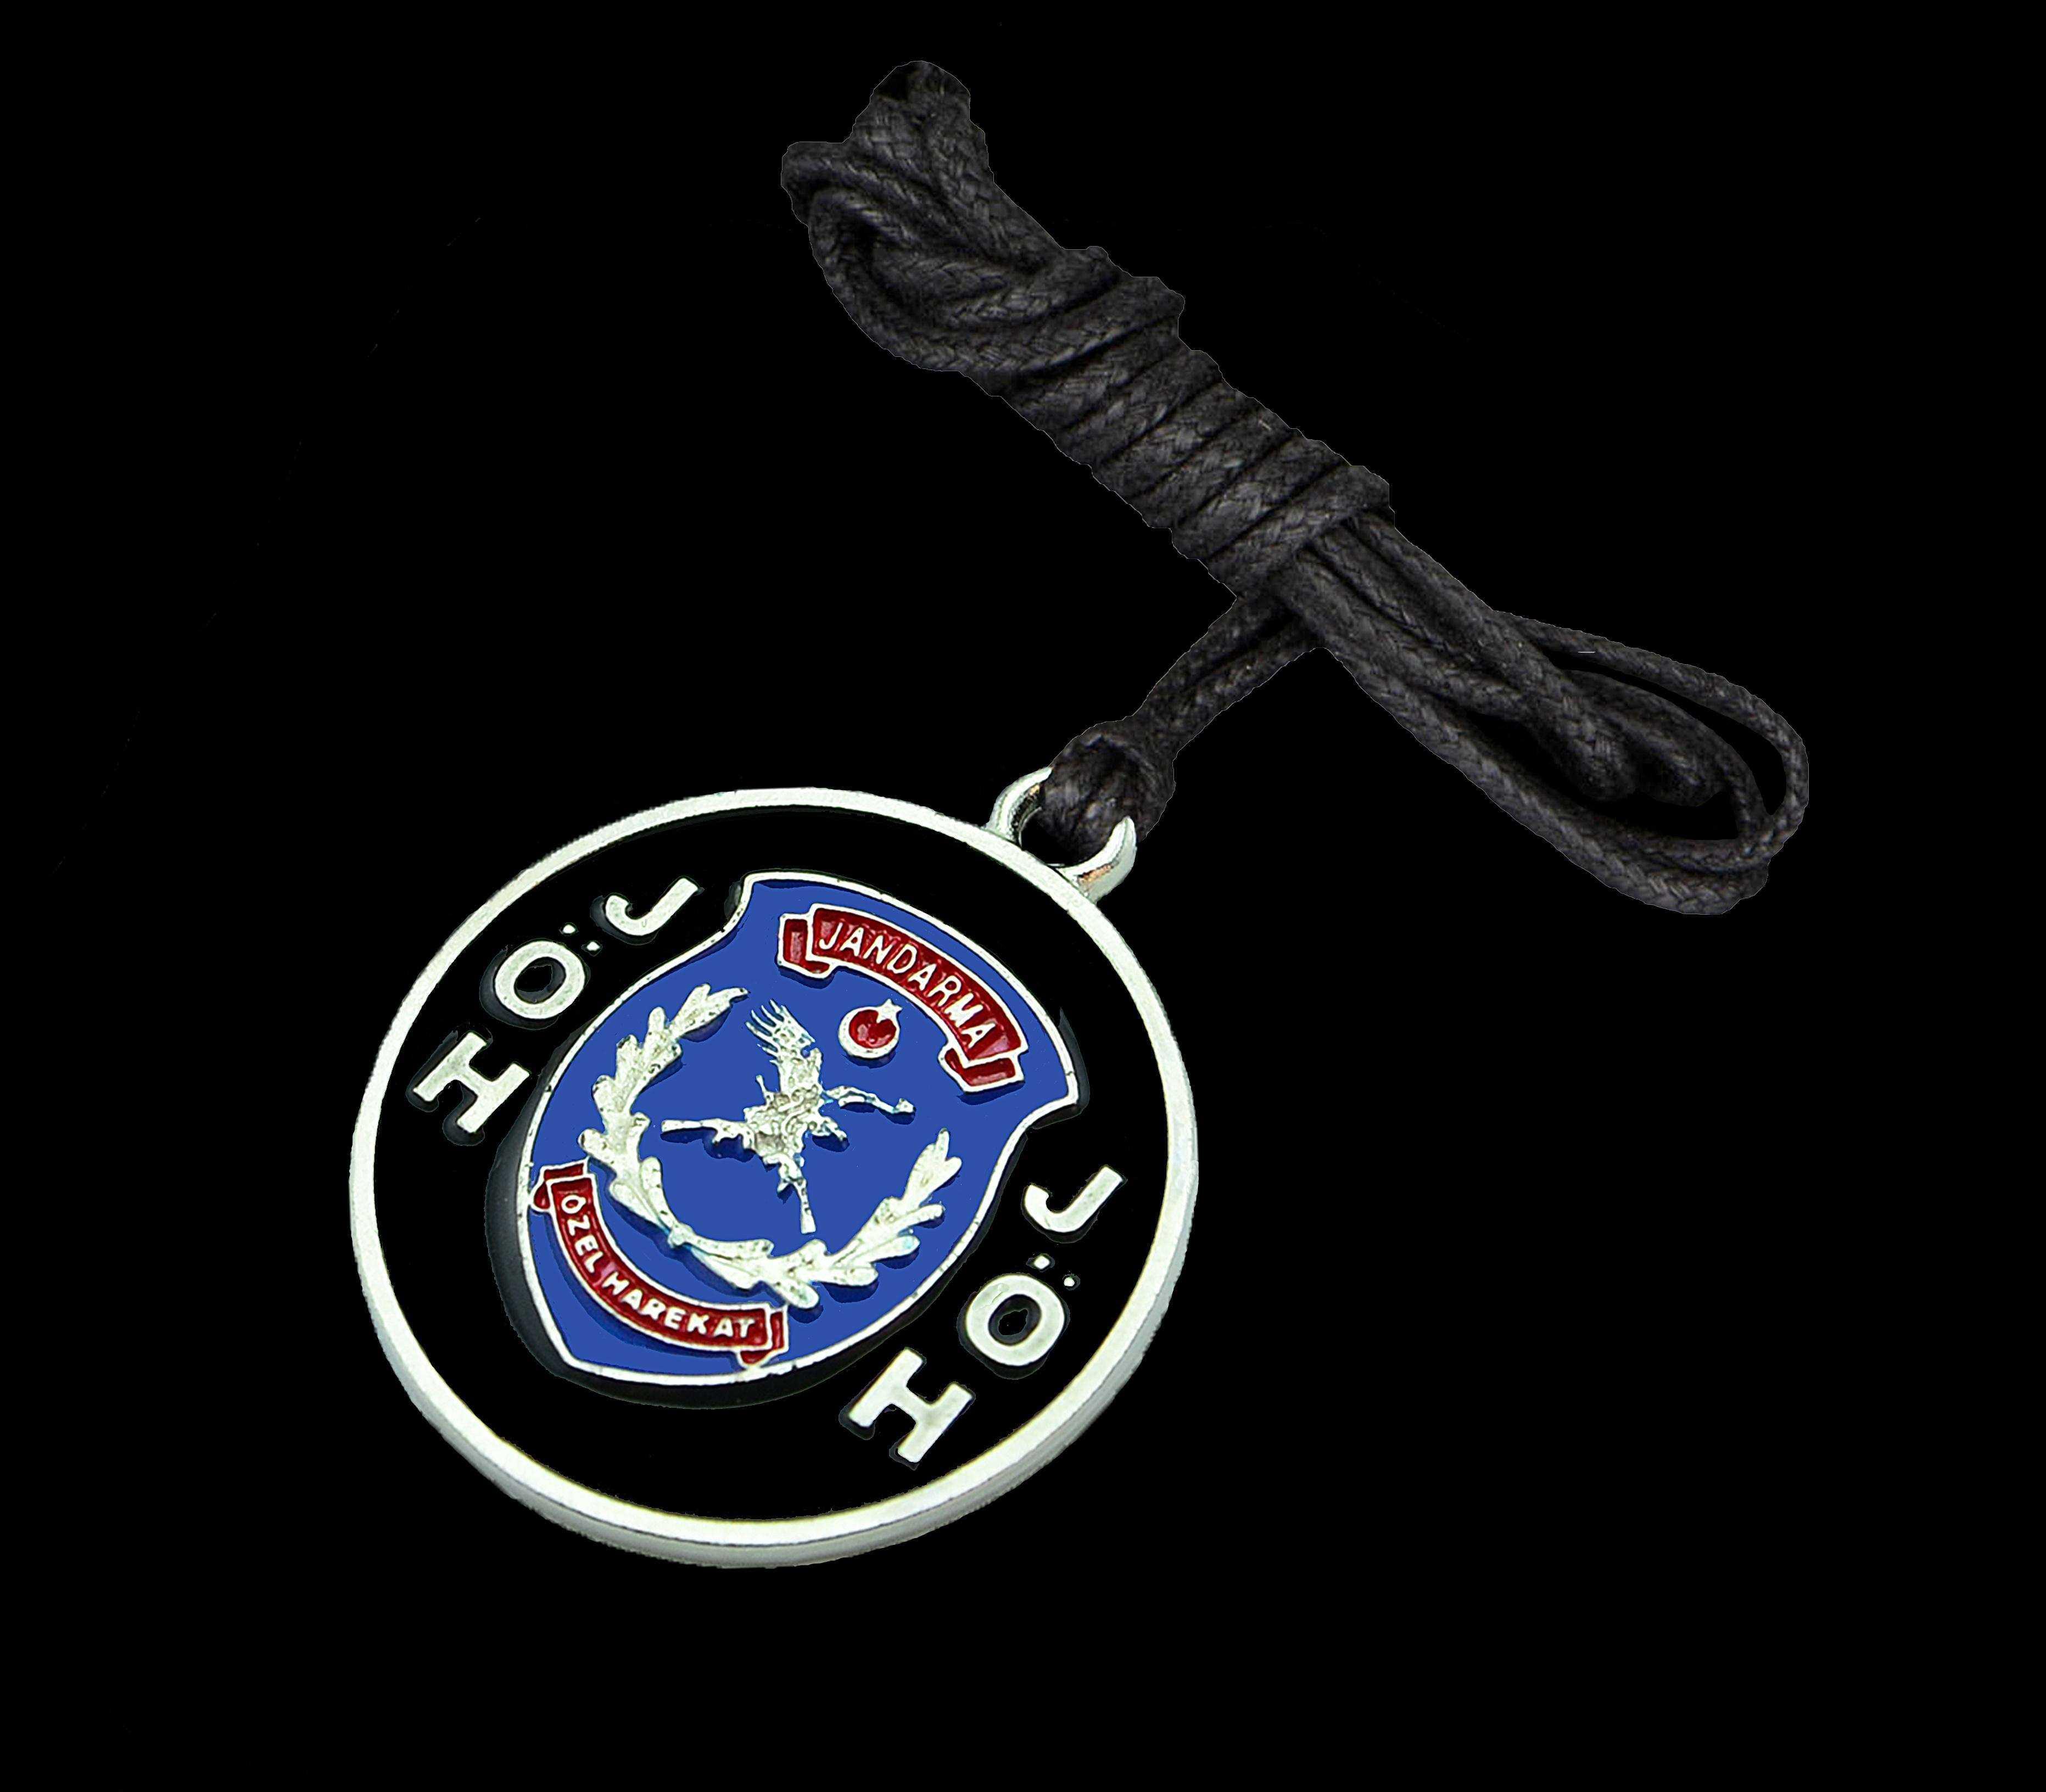 JÖH Jandarma Özel Harekat Kolye - KOL0002